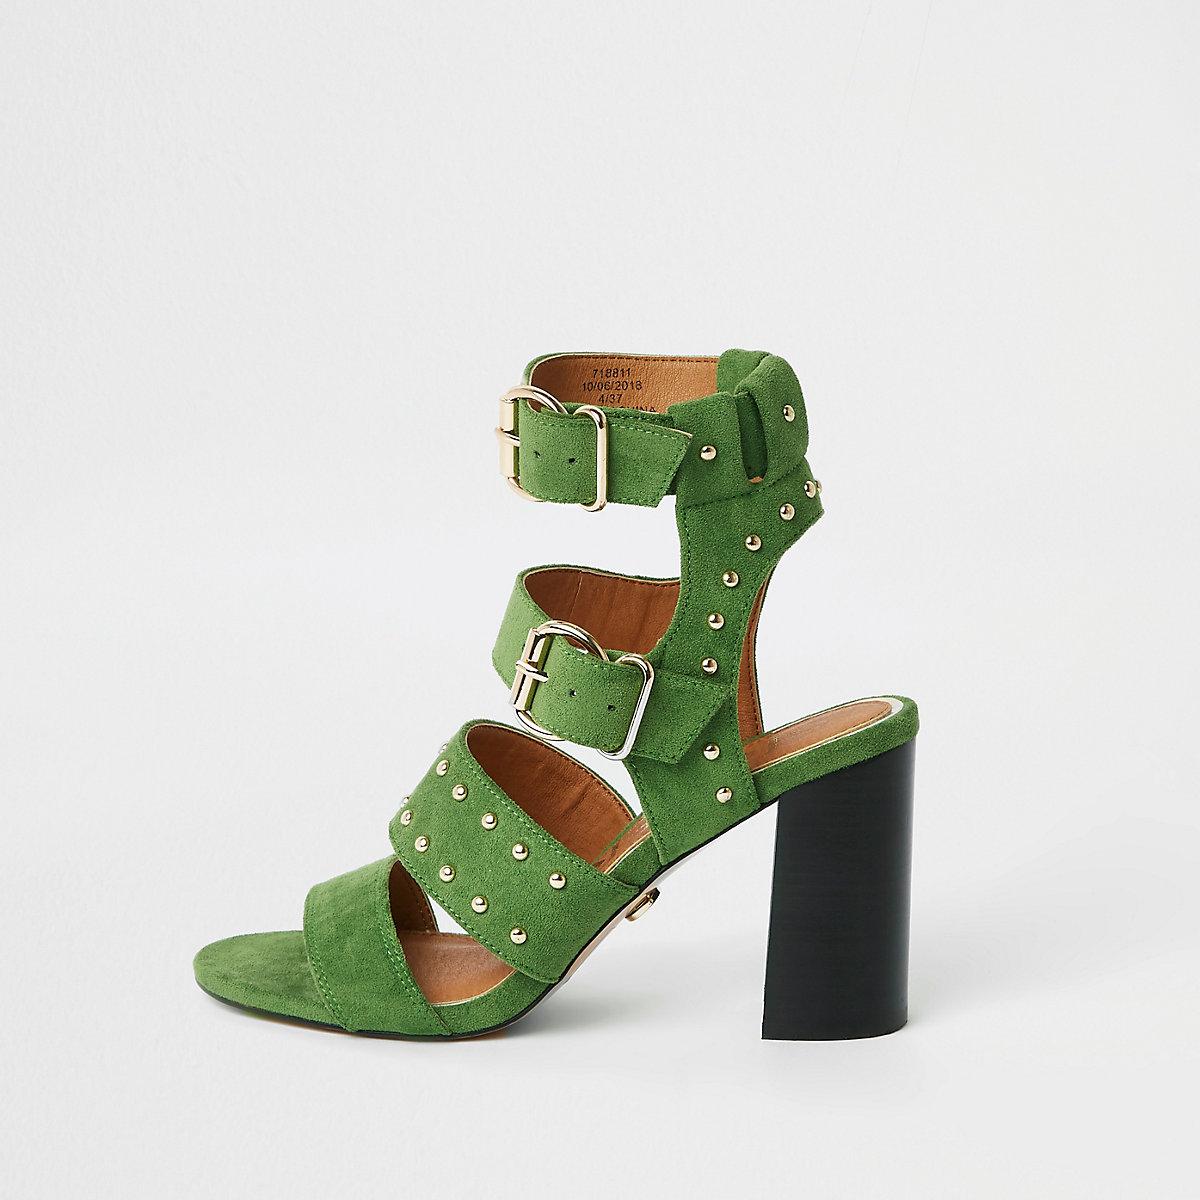 d83c177bc19 Green wide fit suede stud block heel sandals - Sandals - Shoes   Boots -  women